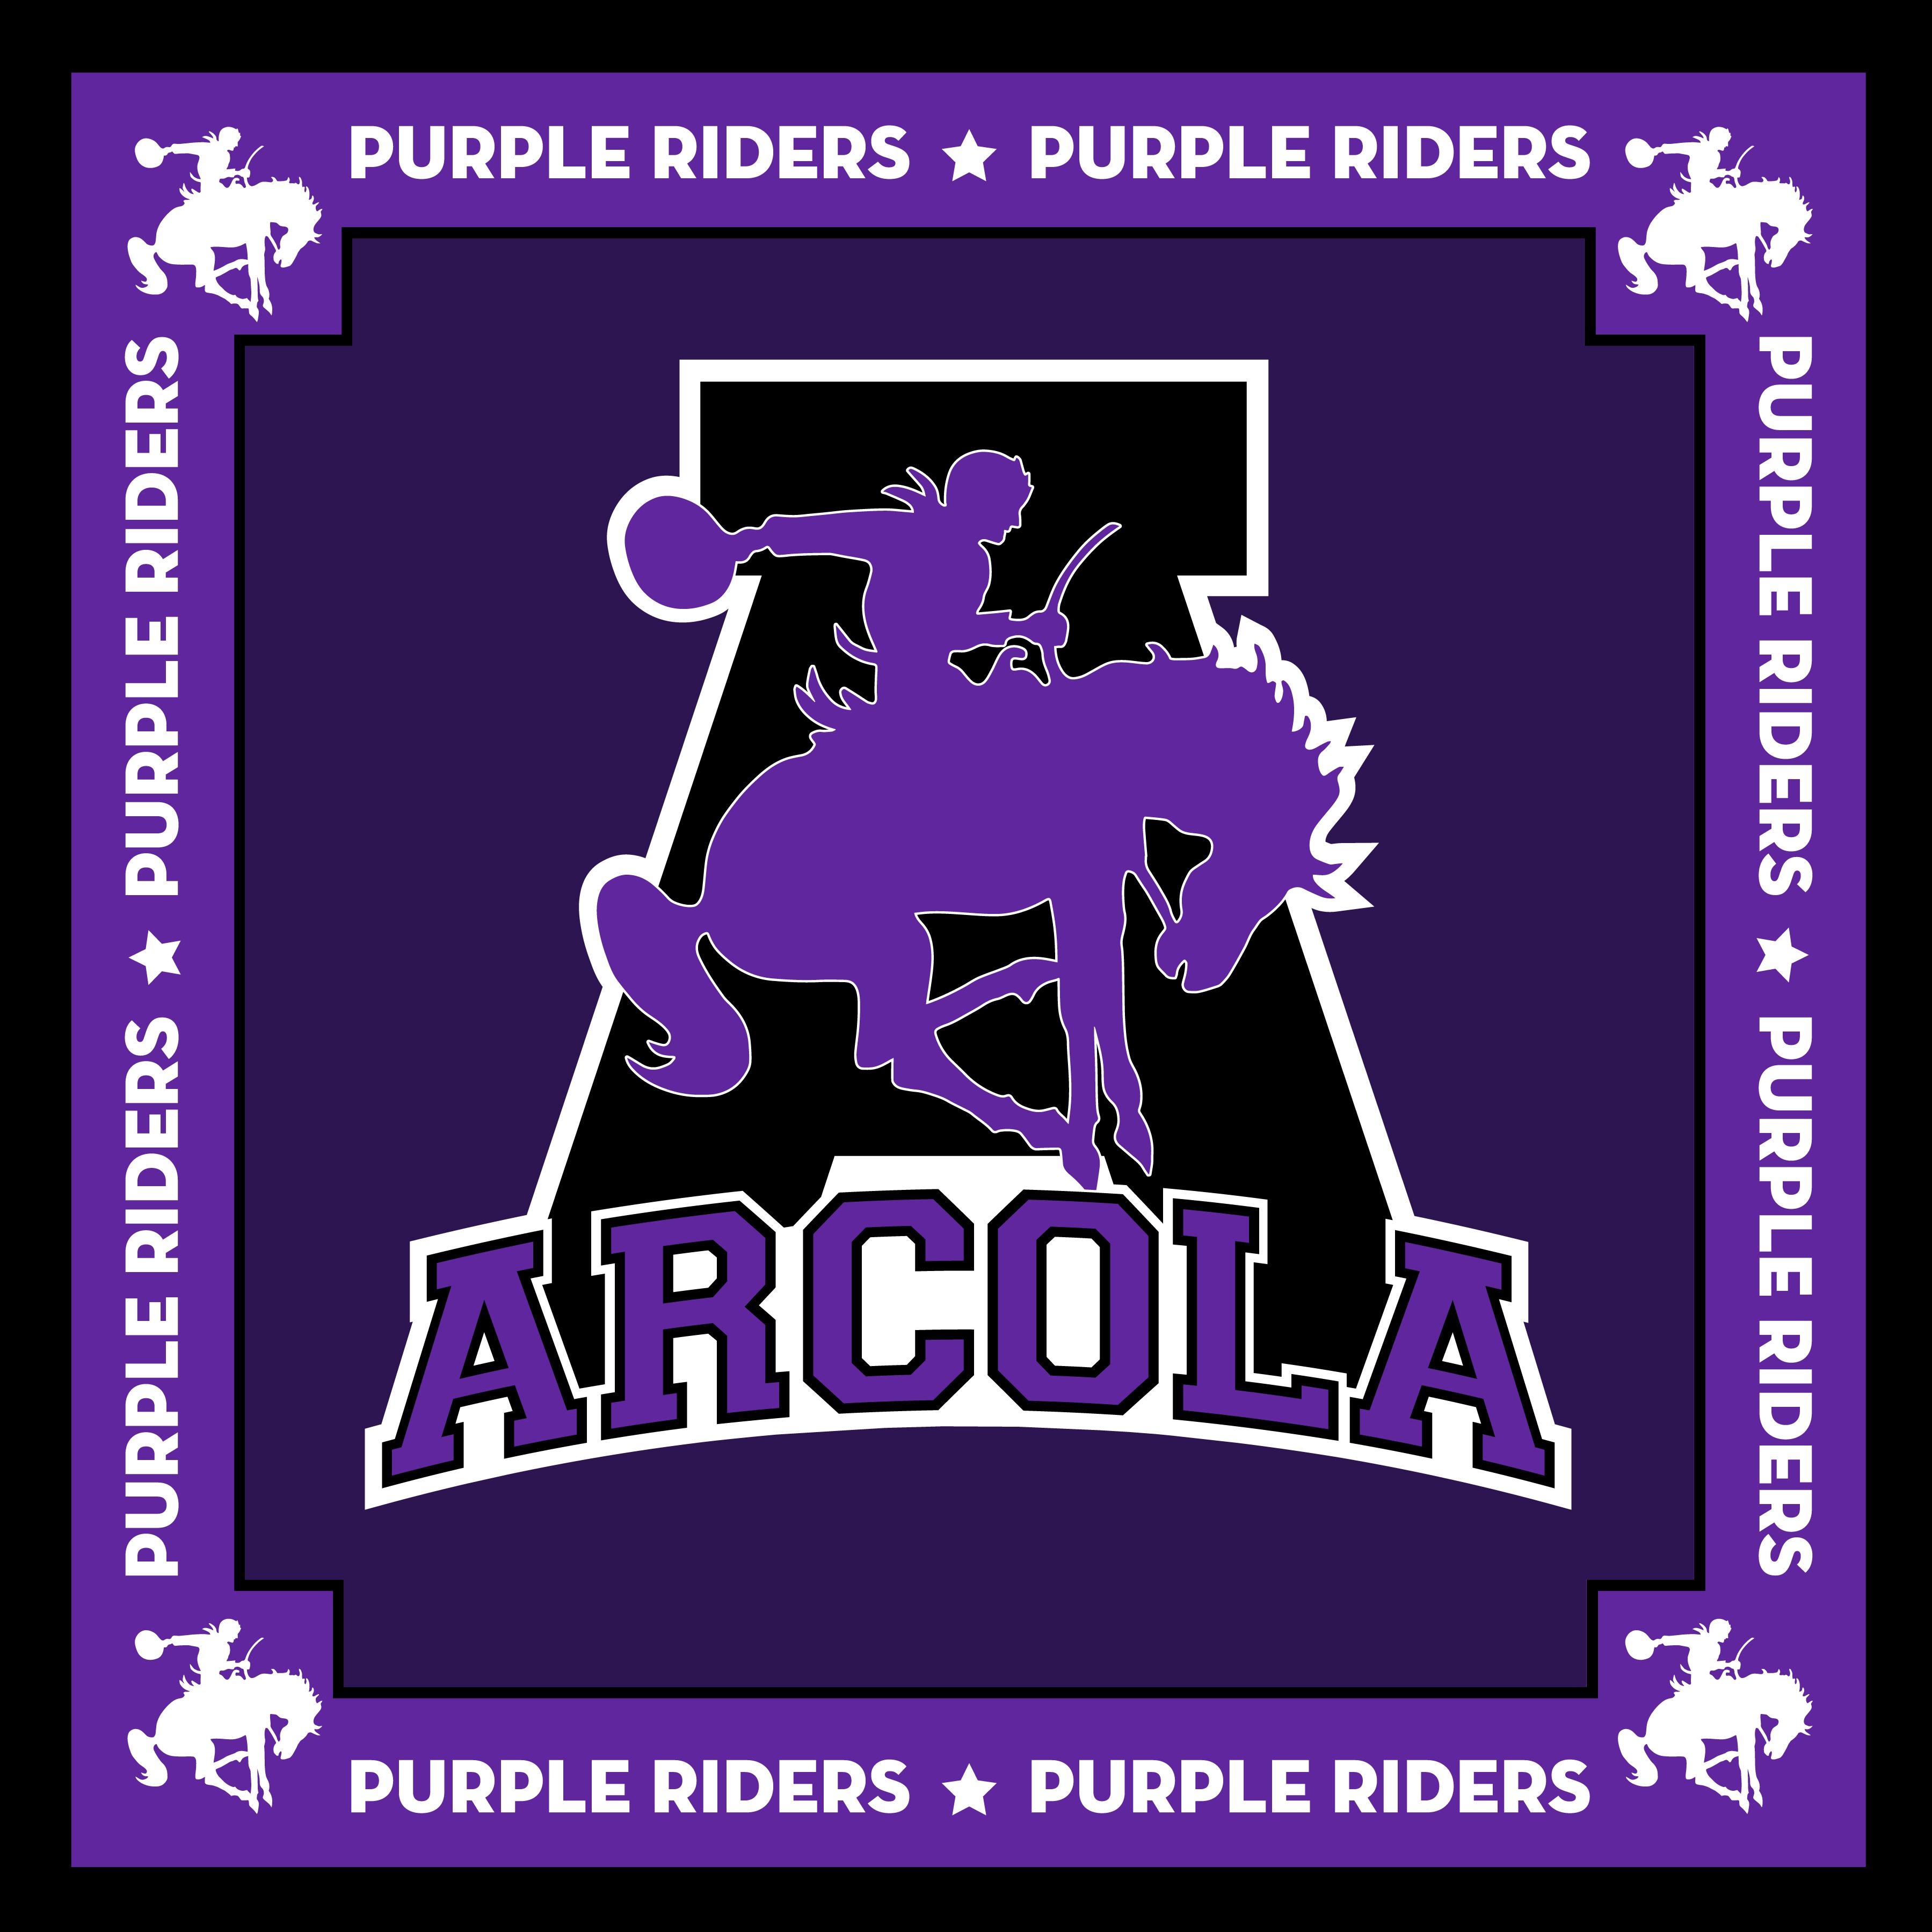 Arcola Blanket 3